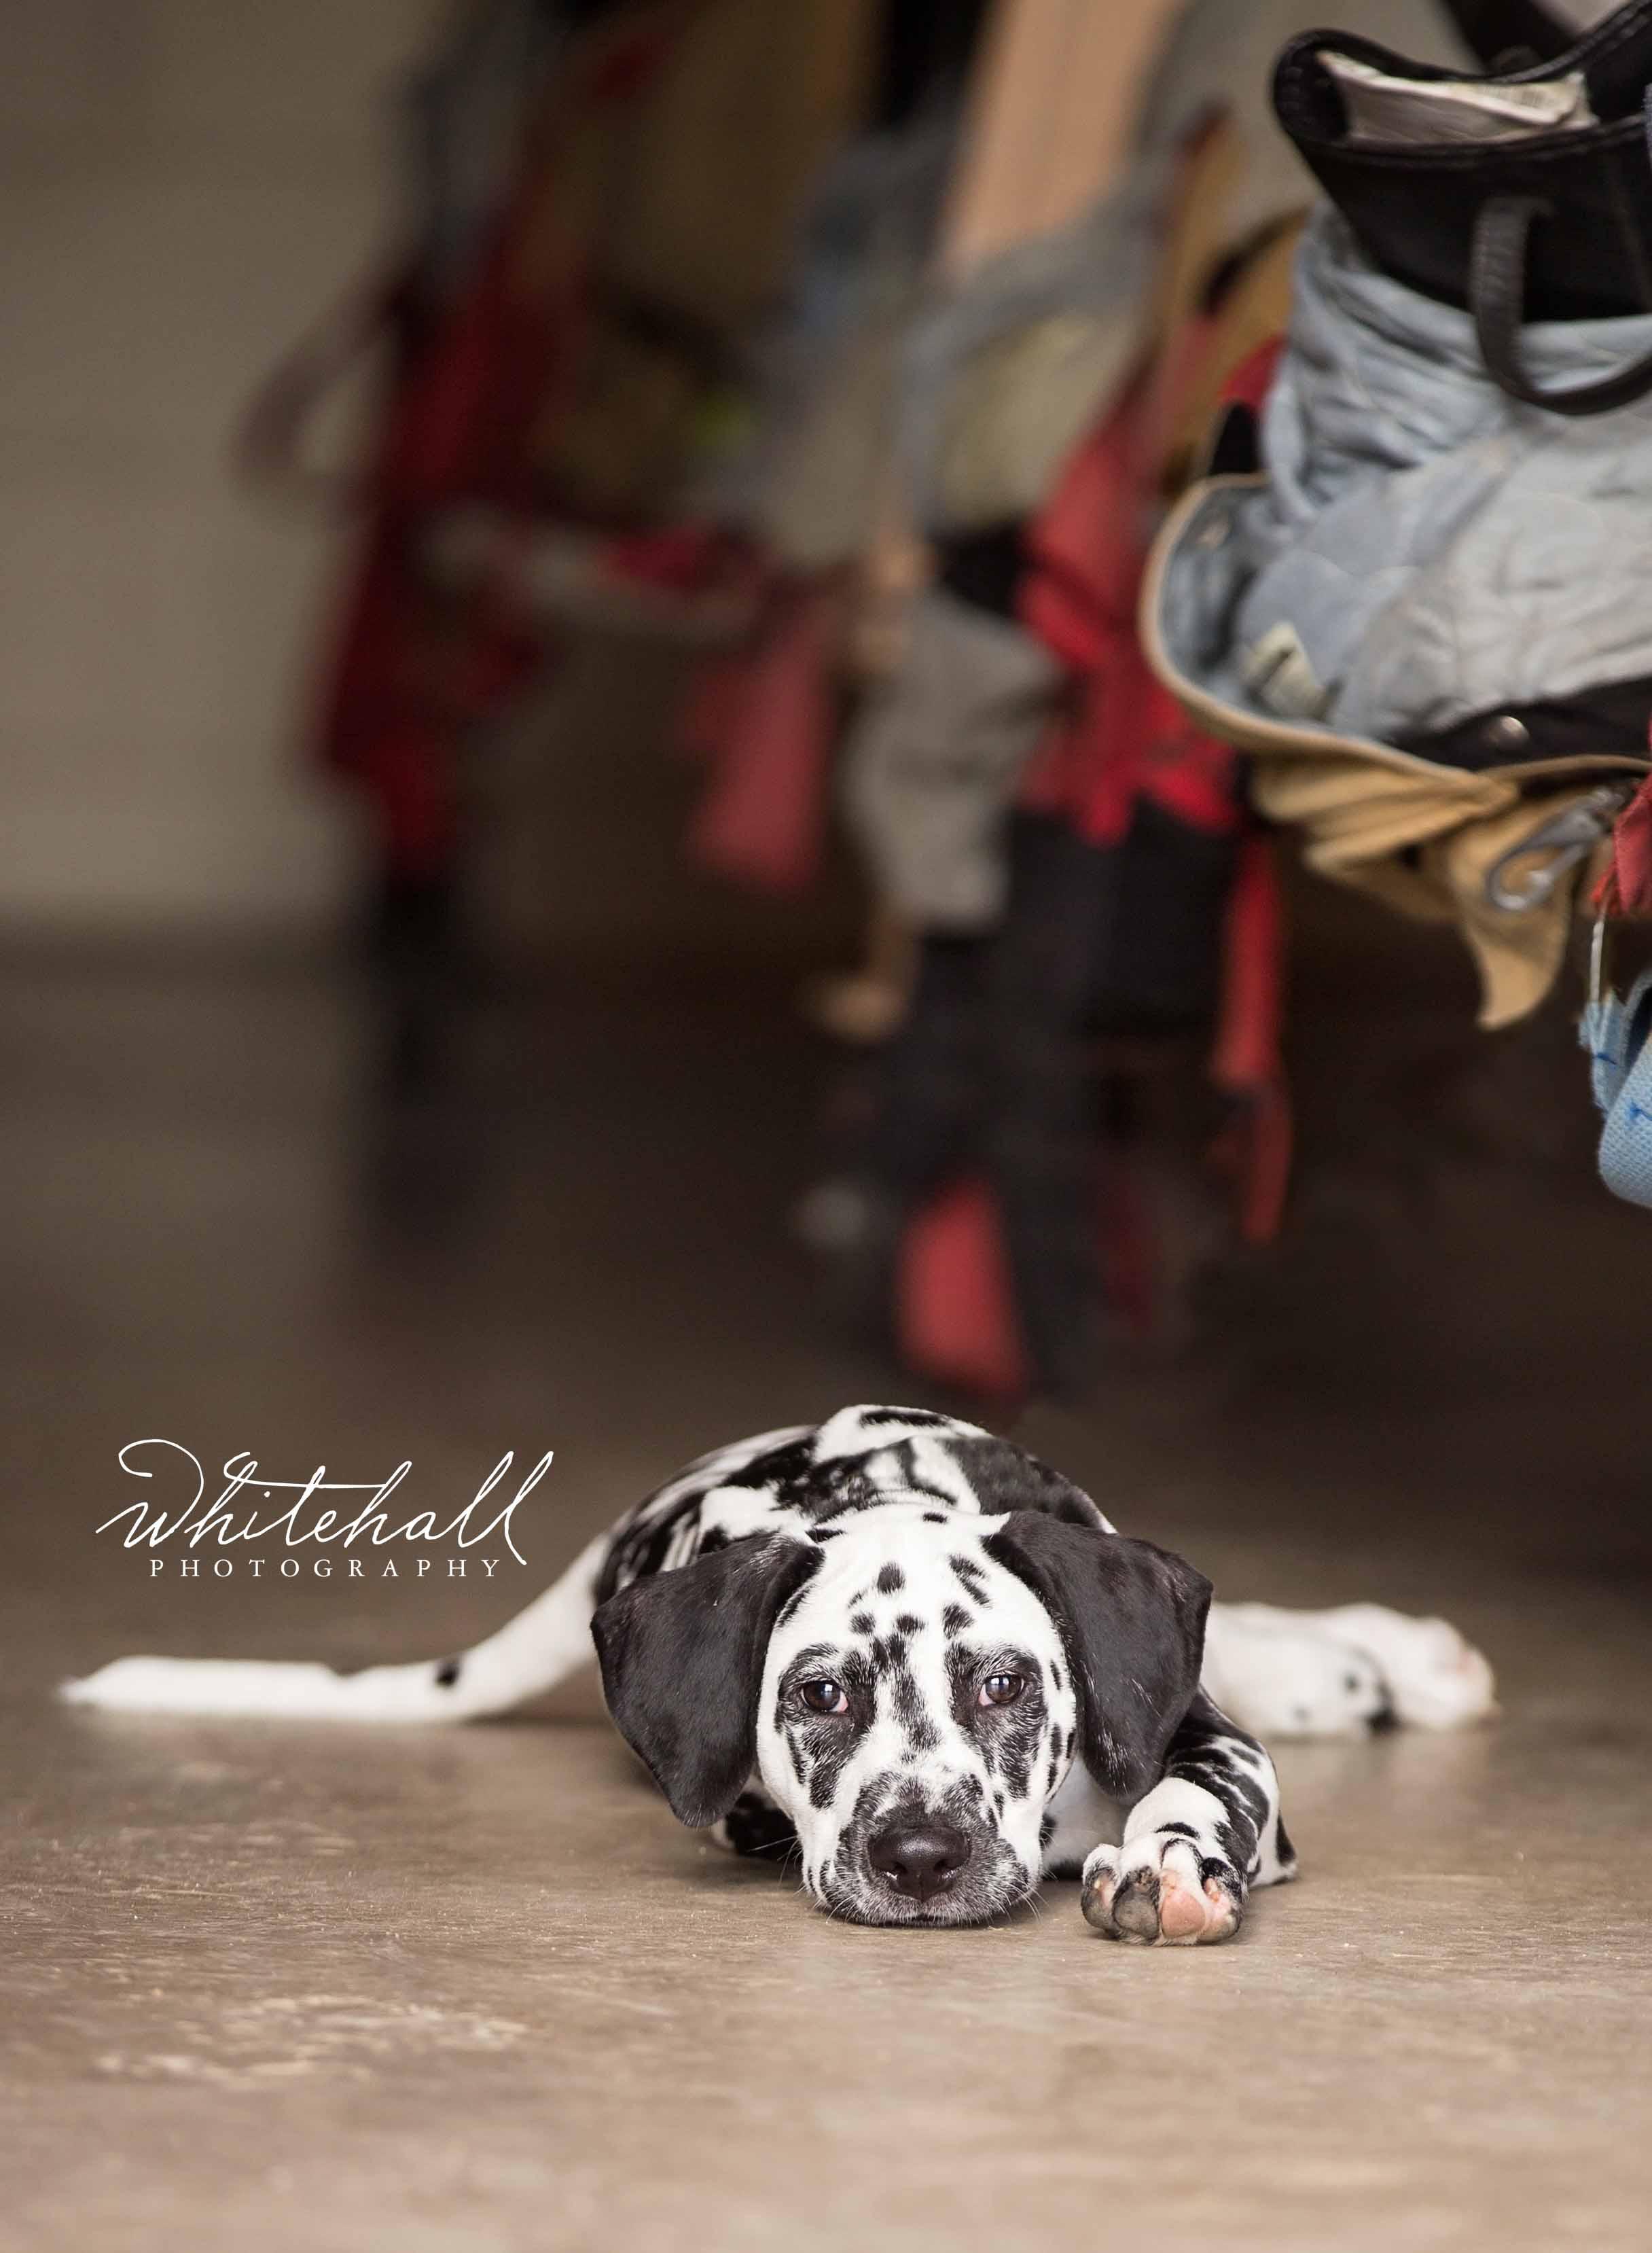 St-Louis-Dog-Photographer-01 (2).jpg